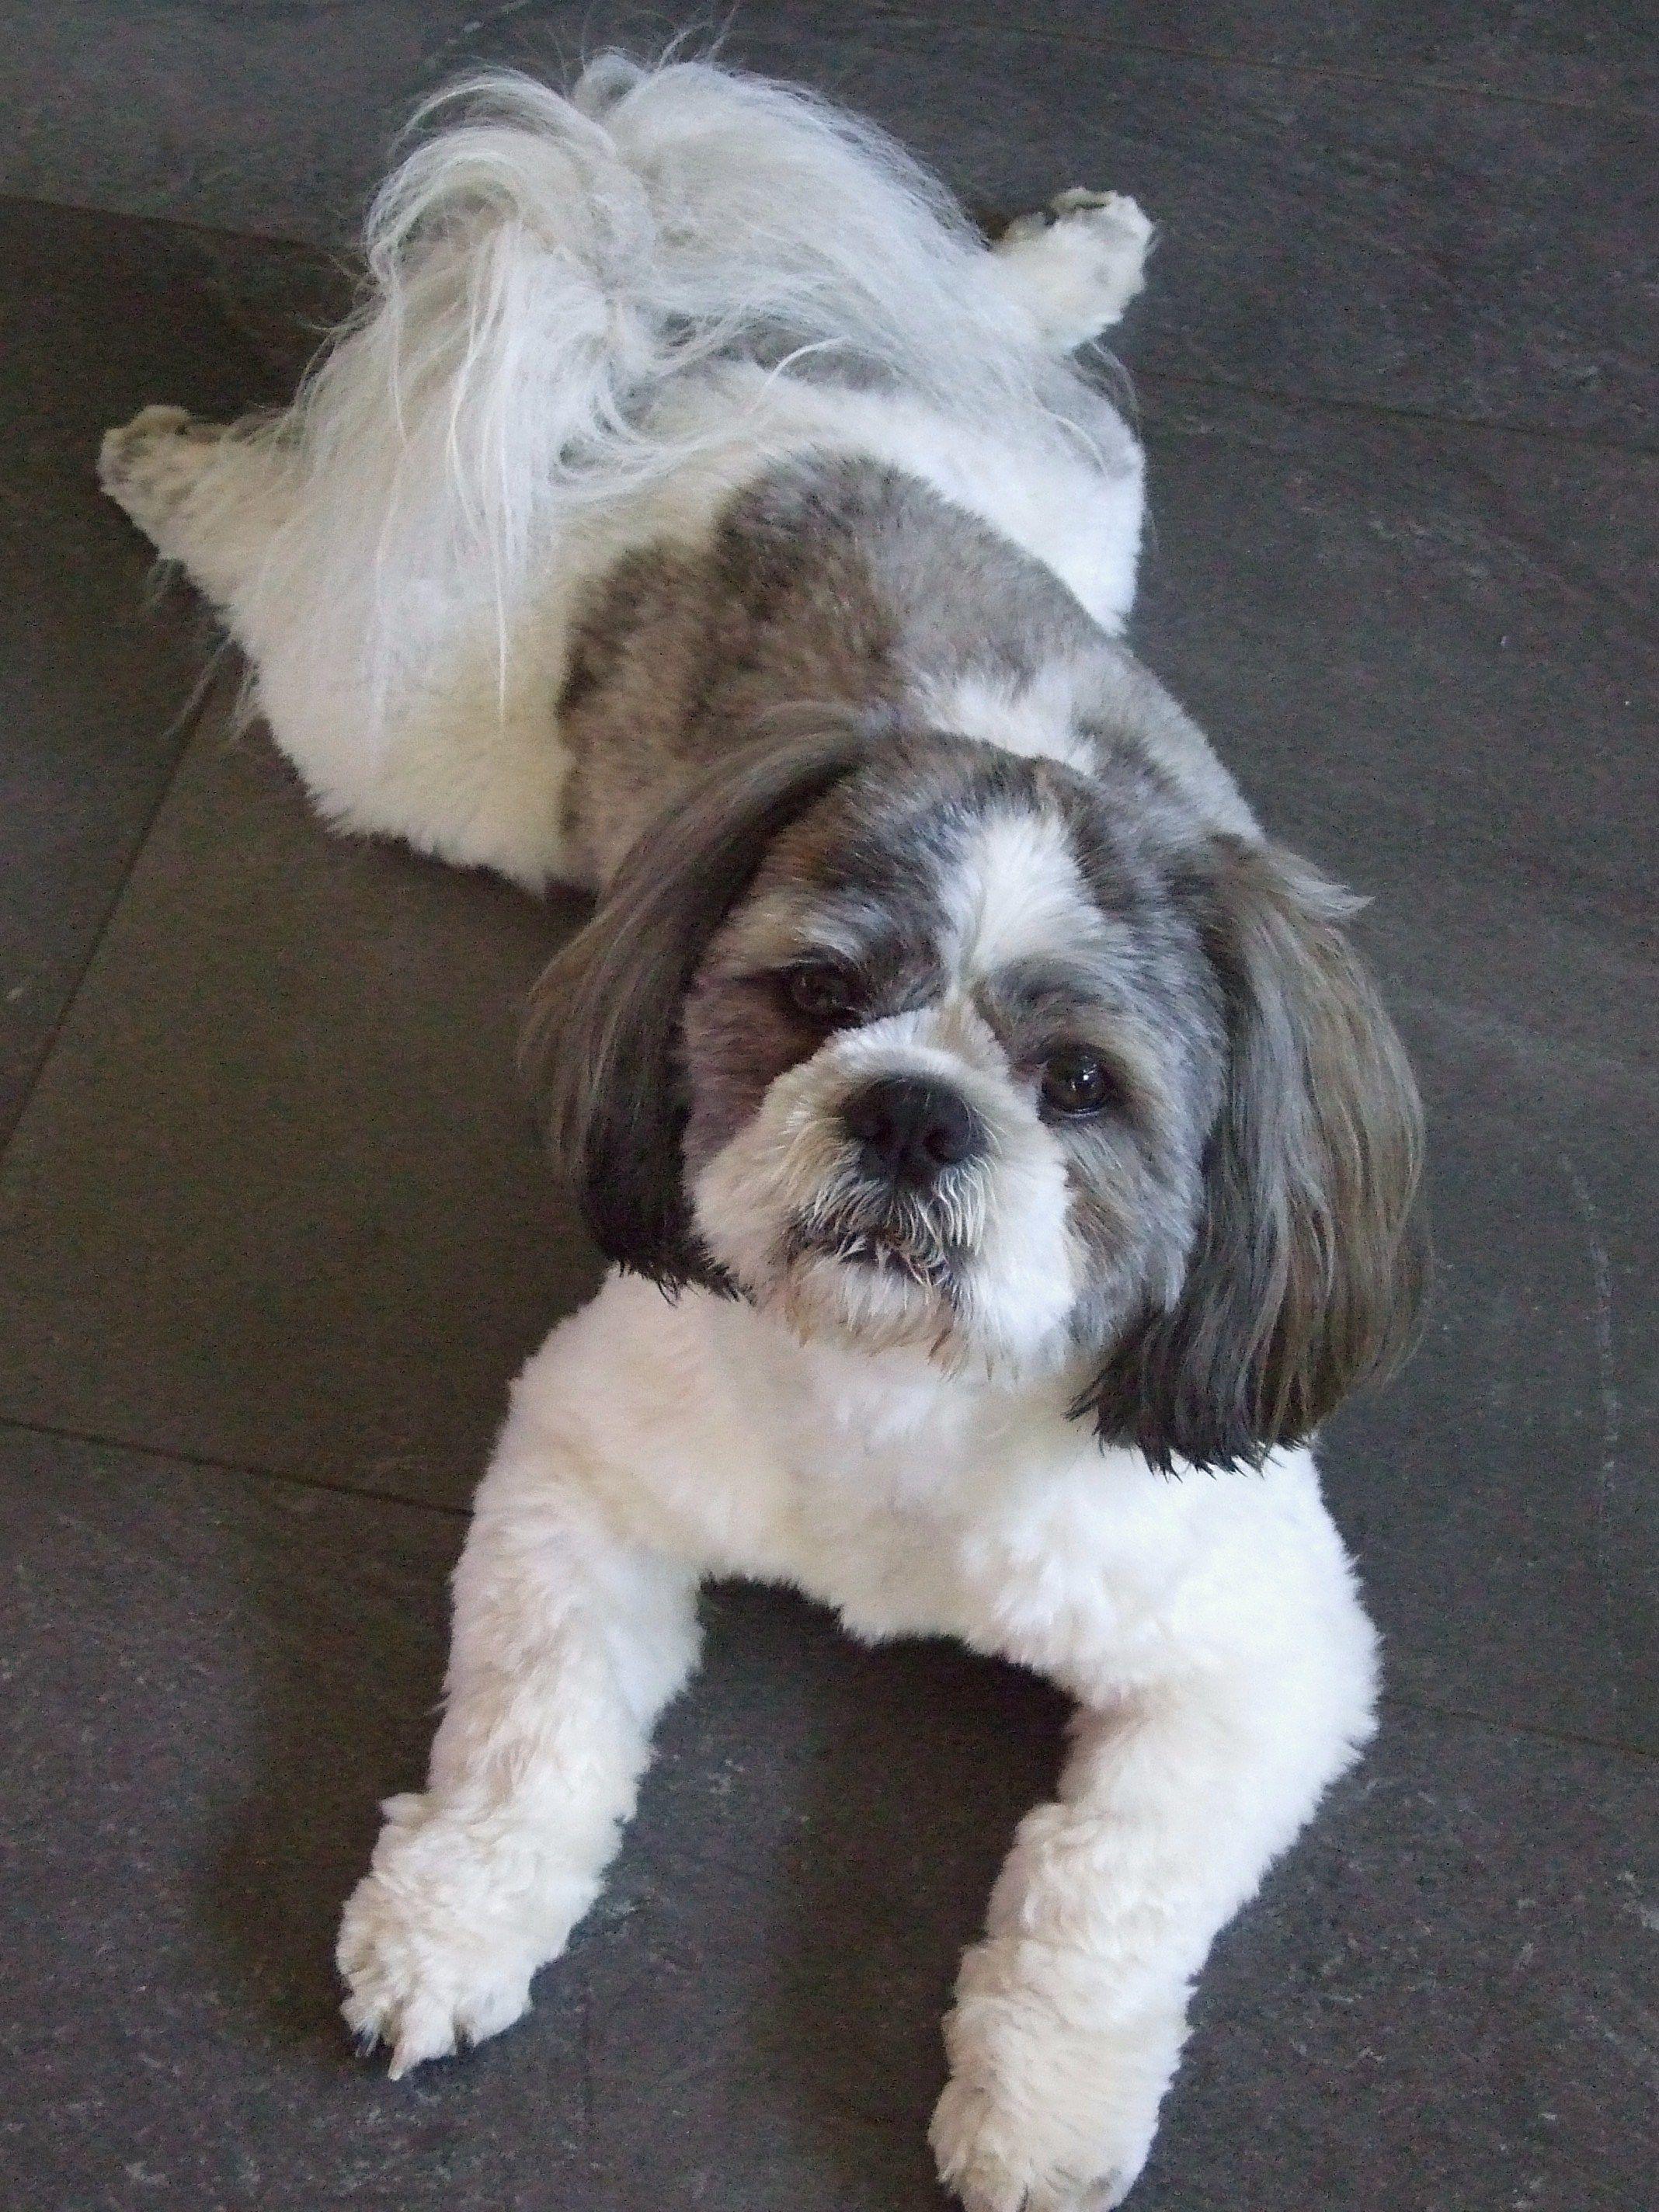 Lucky 38 Il A Chaud Shih Tzu Puppy Shih Tzu Dog Breeds